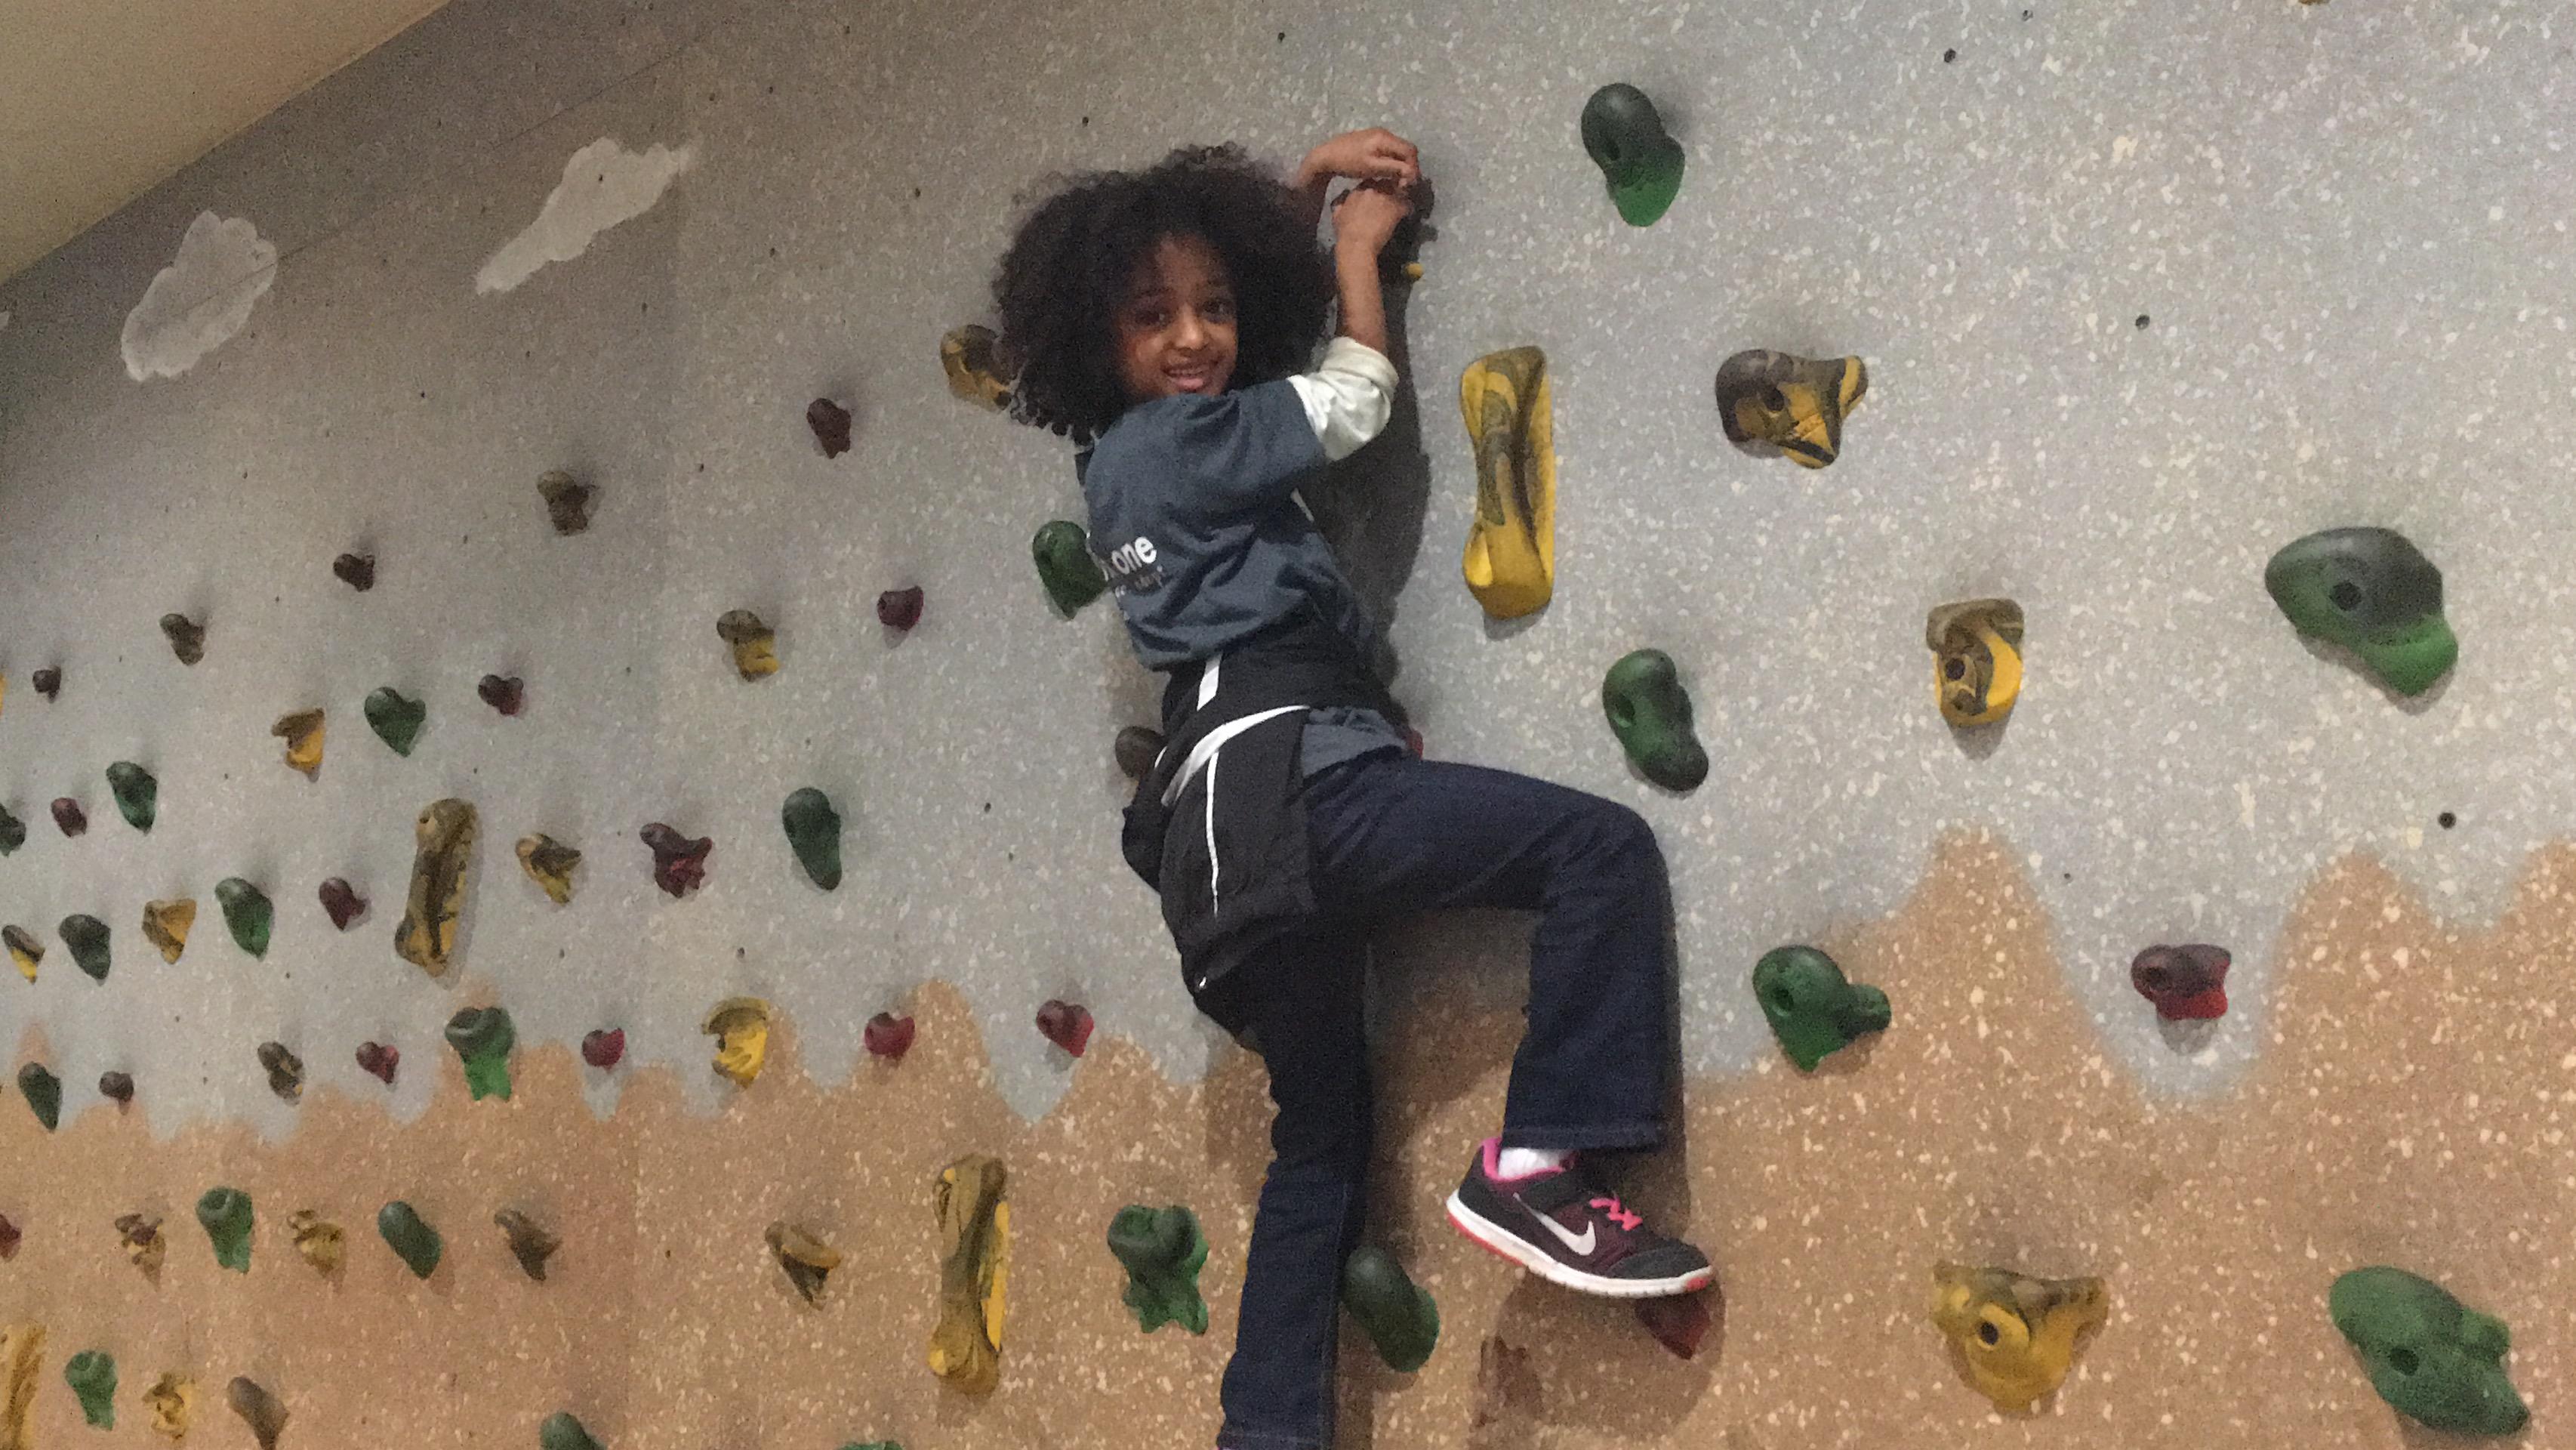 yodit-enjoyed-climbing-the-wall_31938672393_o